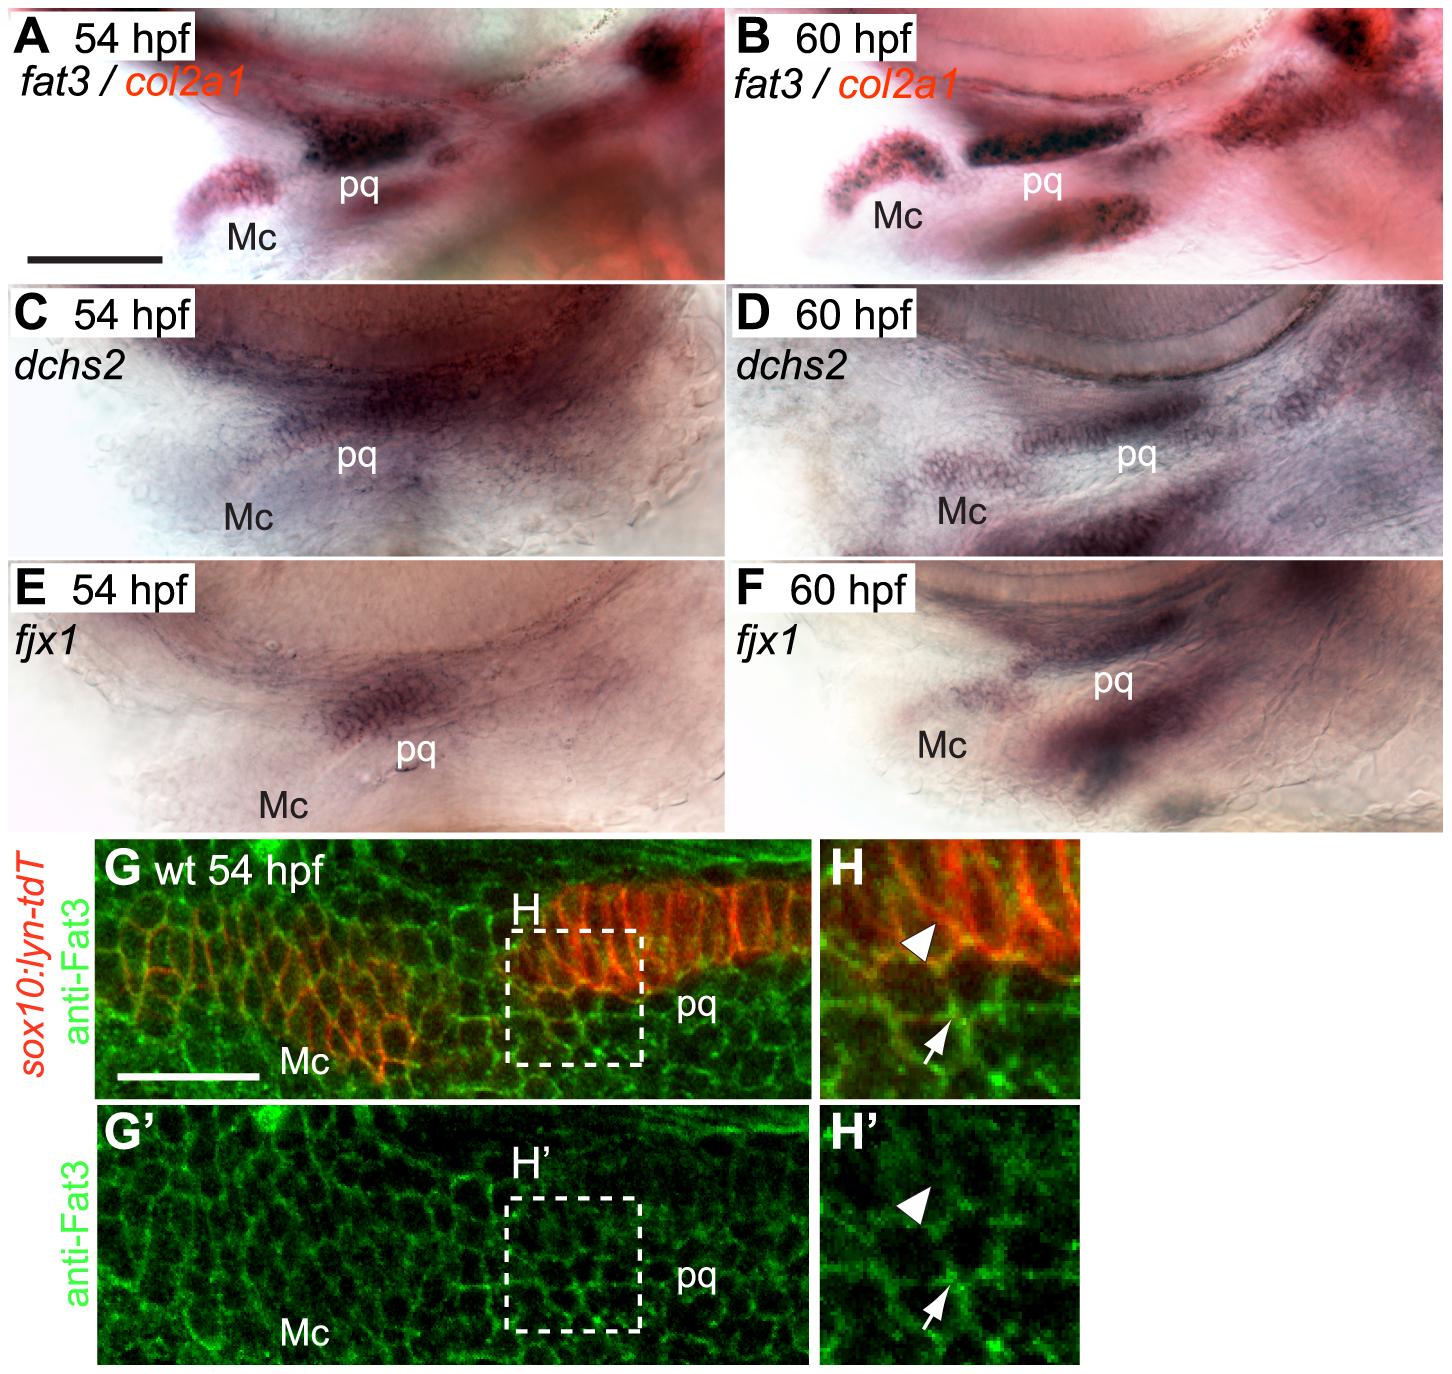 <i>fat3</i>, <i>dchs2</i> and <i>fjx1</i> are expressed in cartilage precursors.